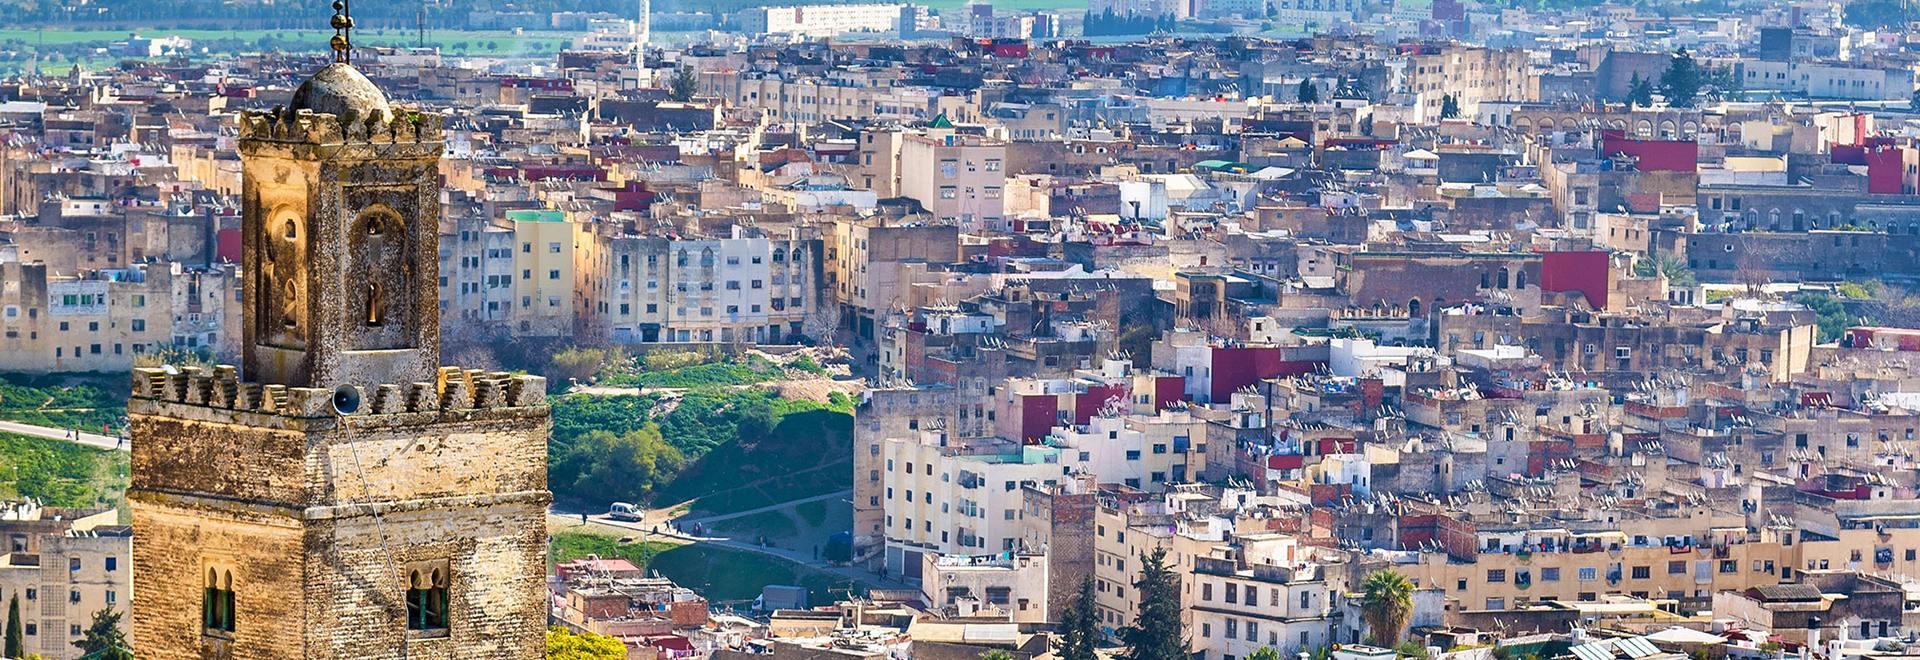 město v Maroku